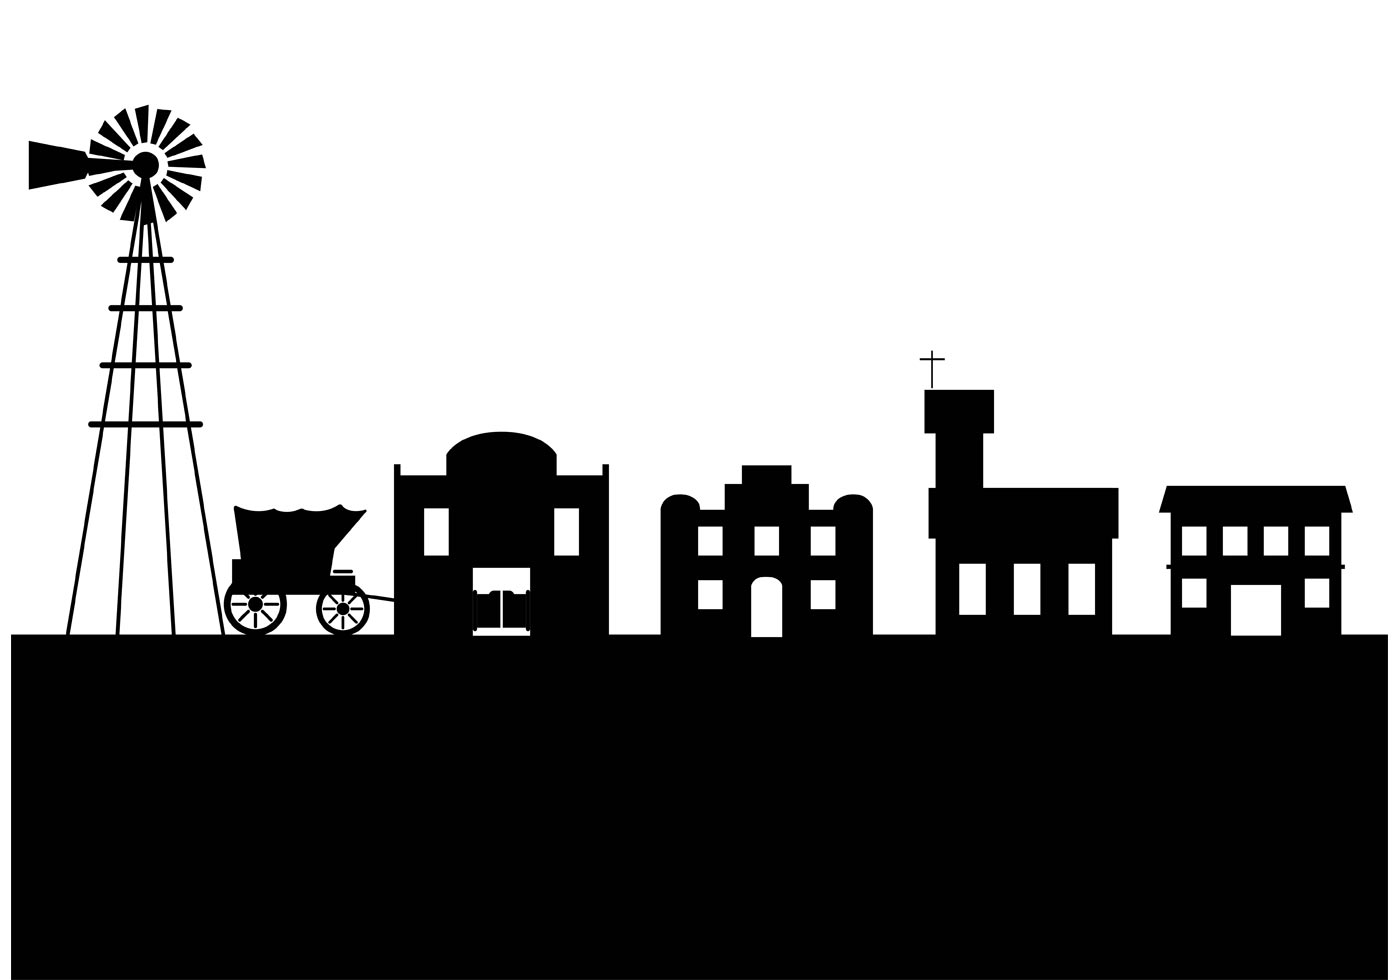 Town Landscape Vector Illustration: Download Free Vectors, Clipart